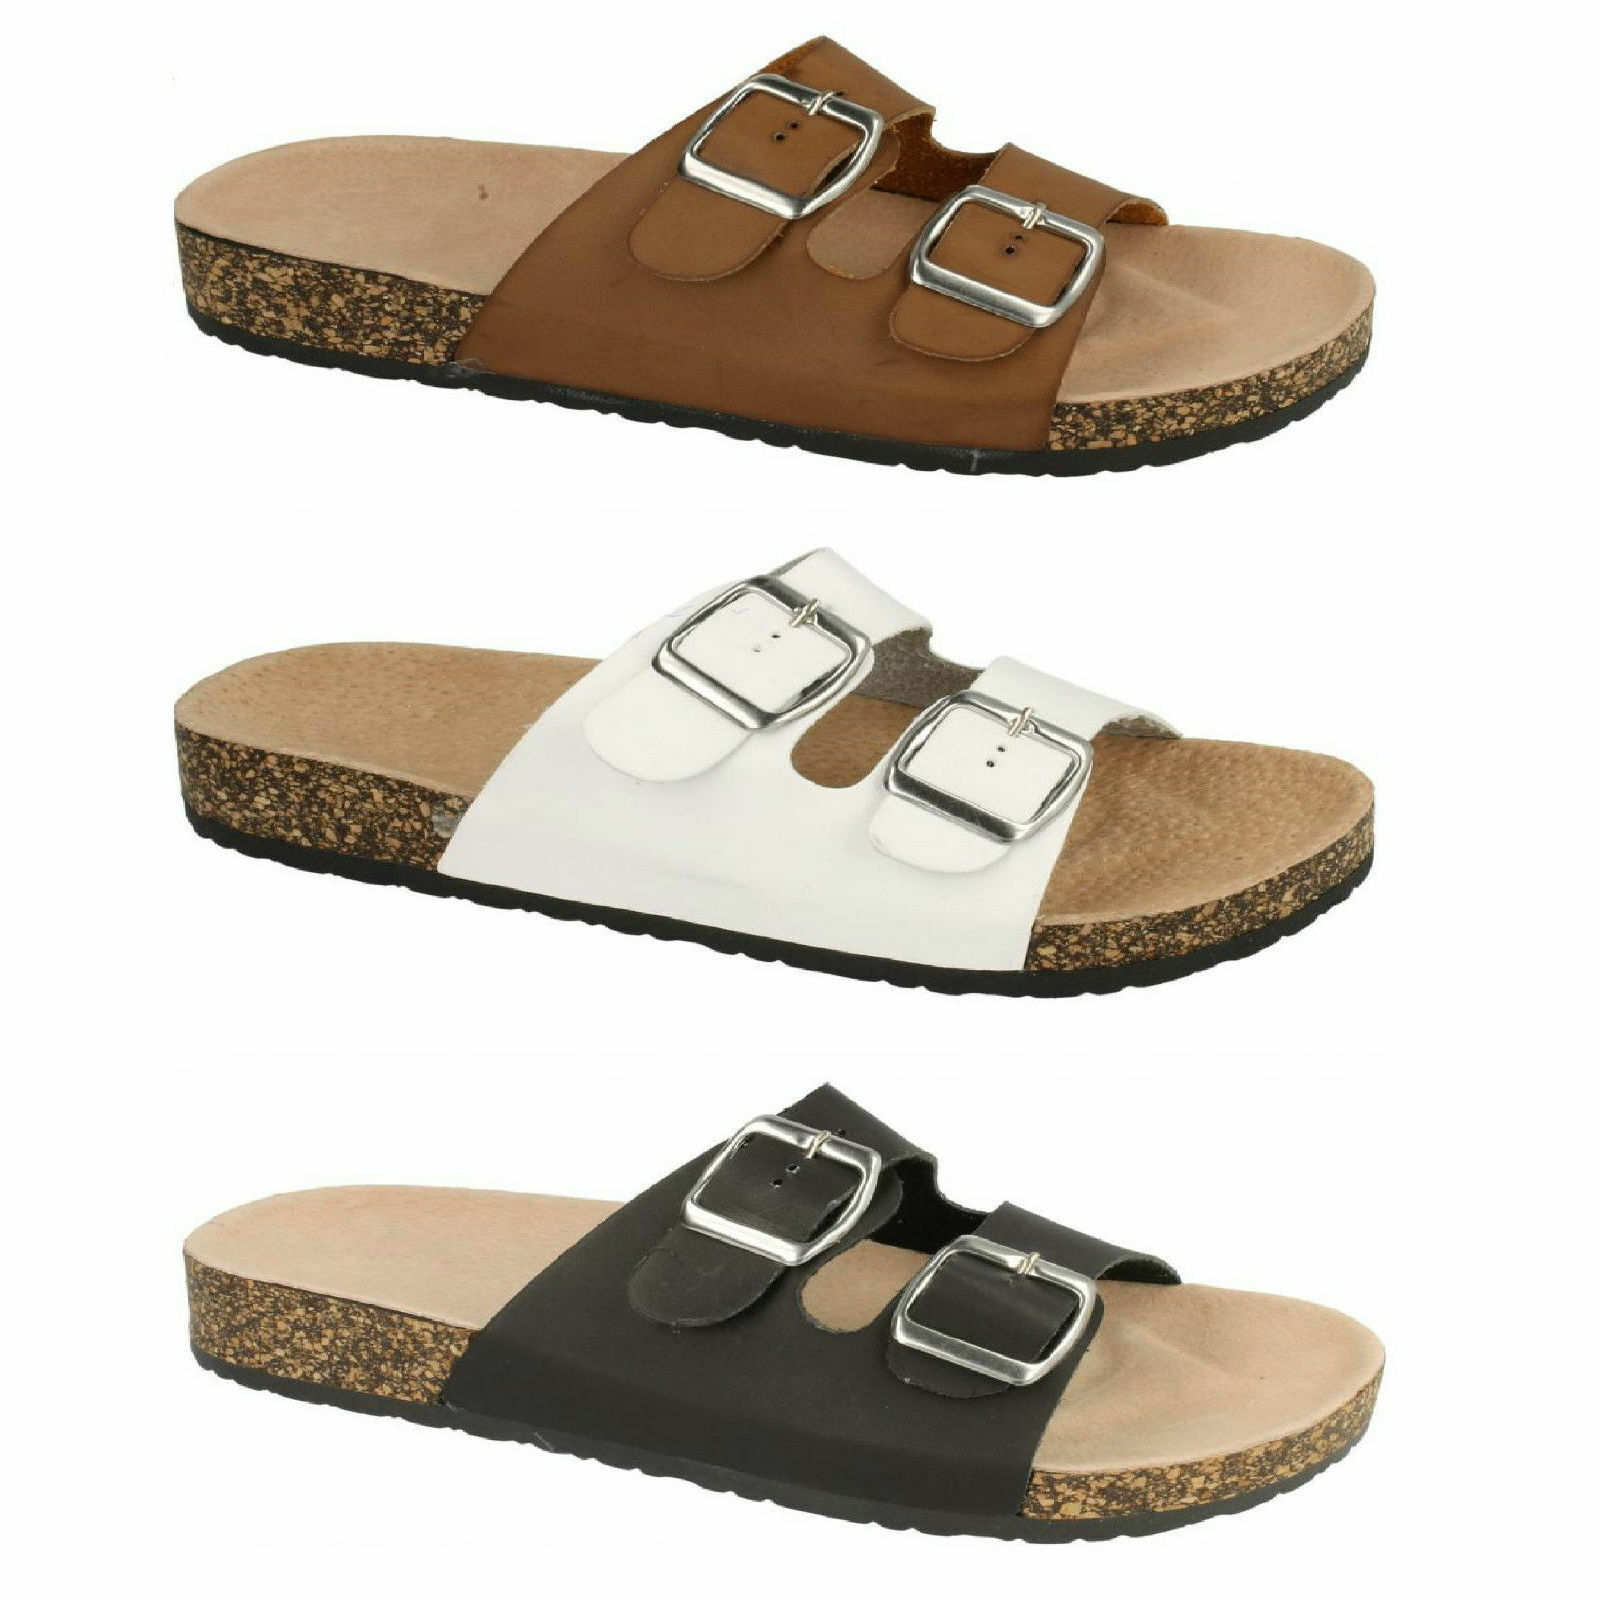 SALE F10292 Ladies Adjustable Mule Twin Buckle Strap Footbed Mule Adjustable Sandals 9c55aa